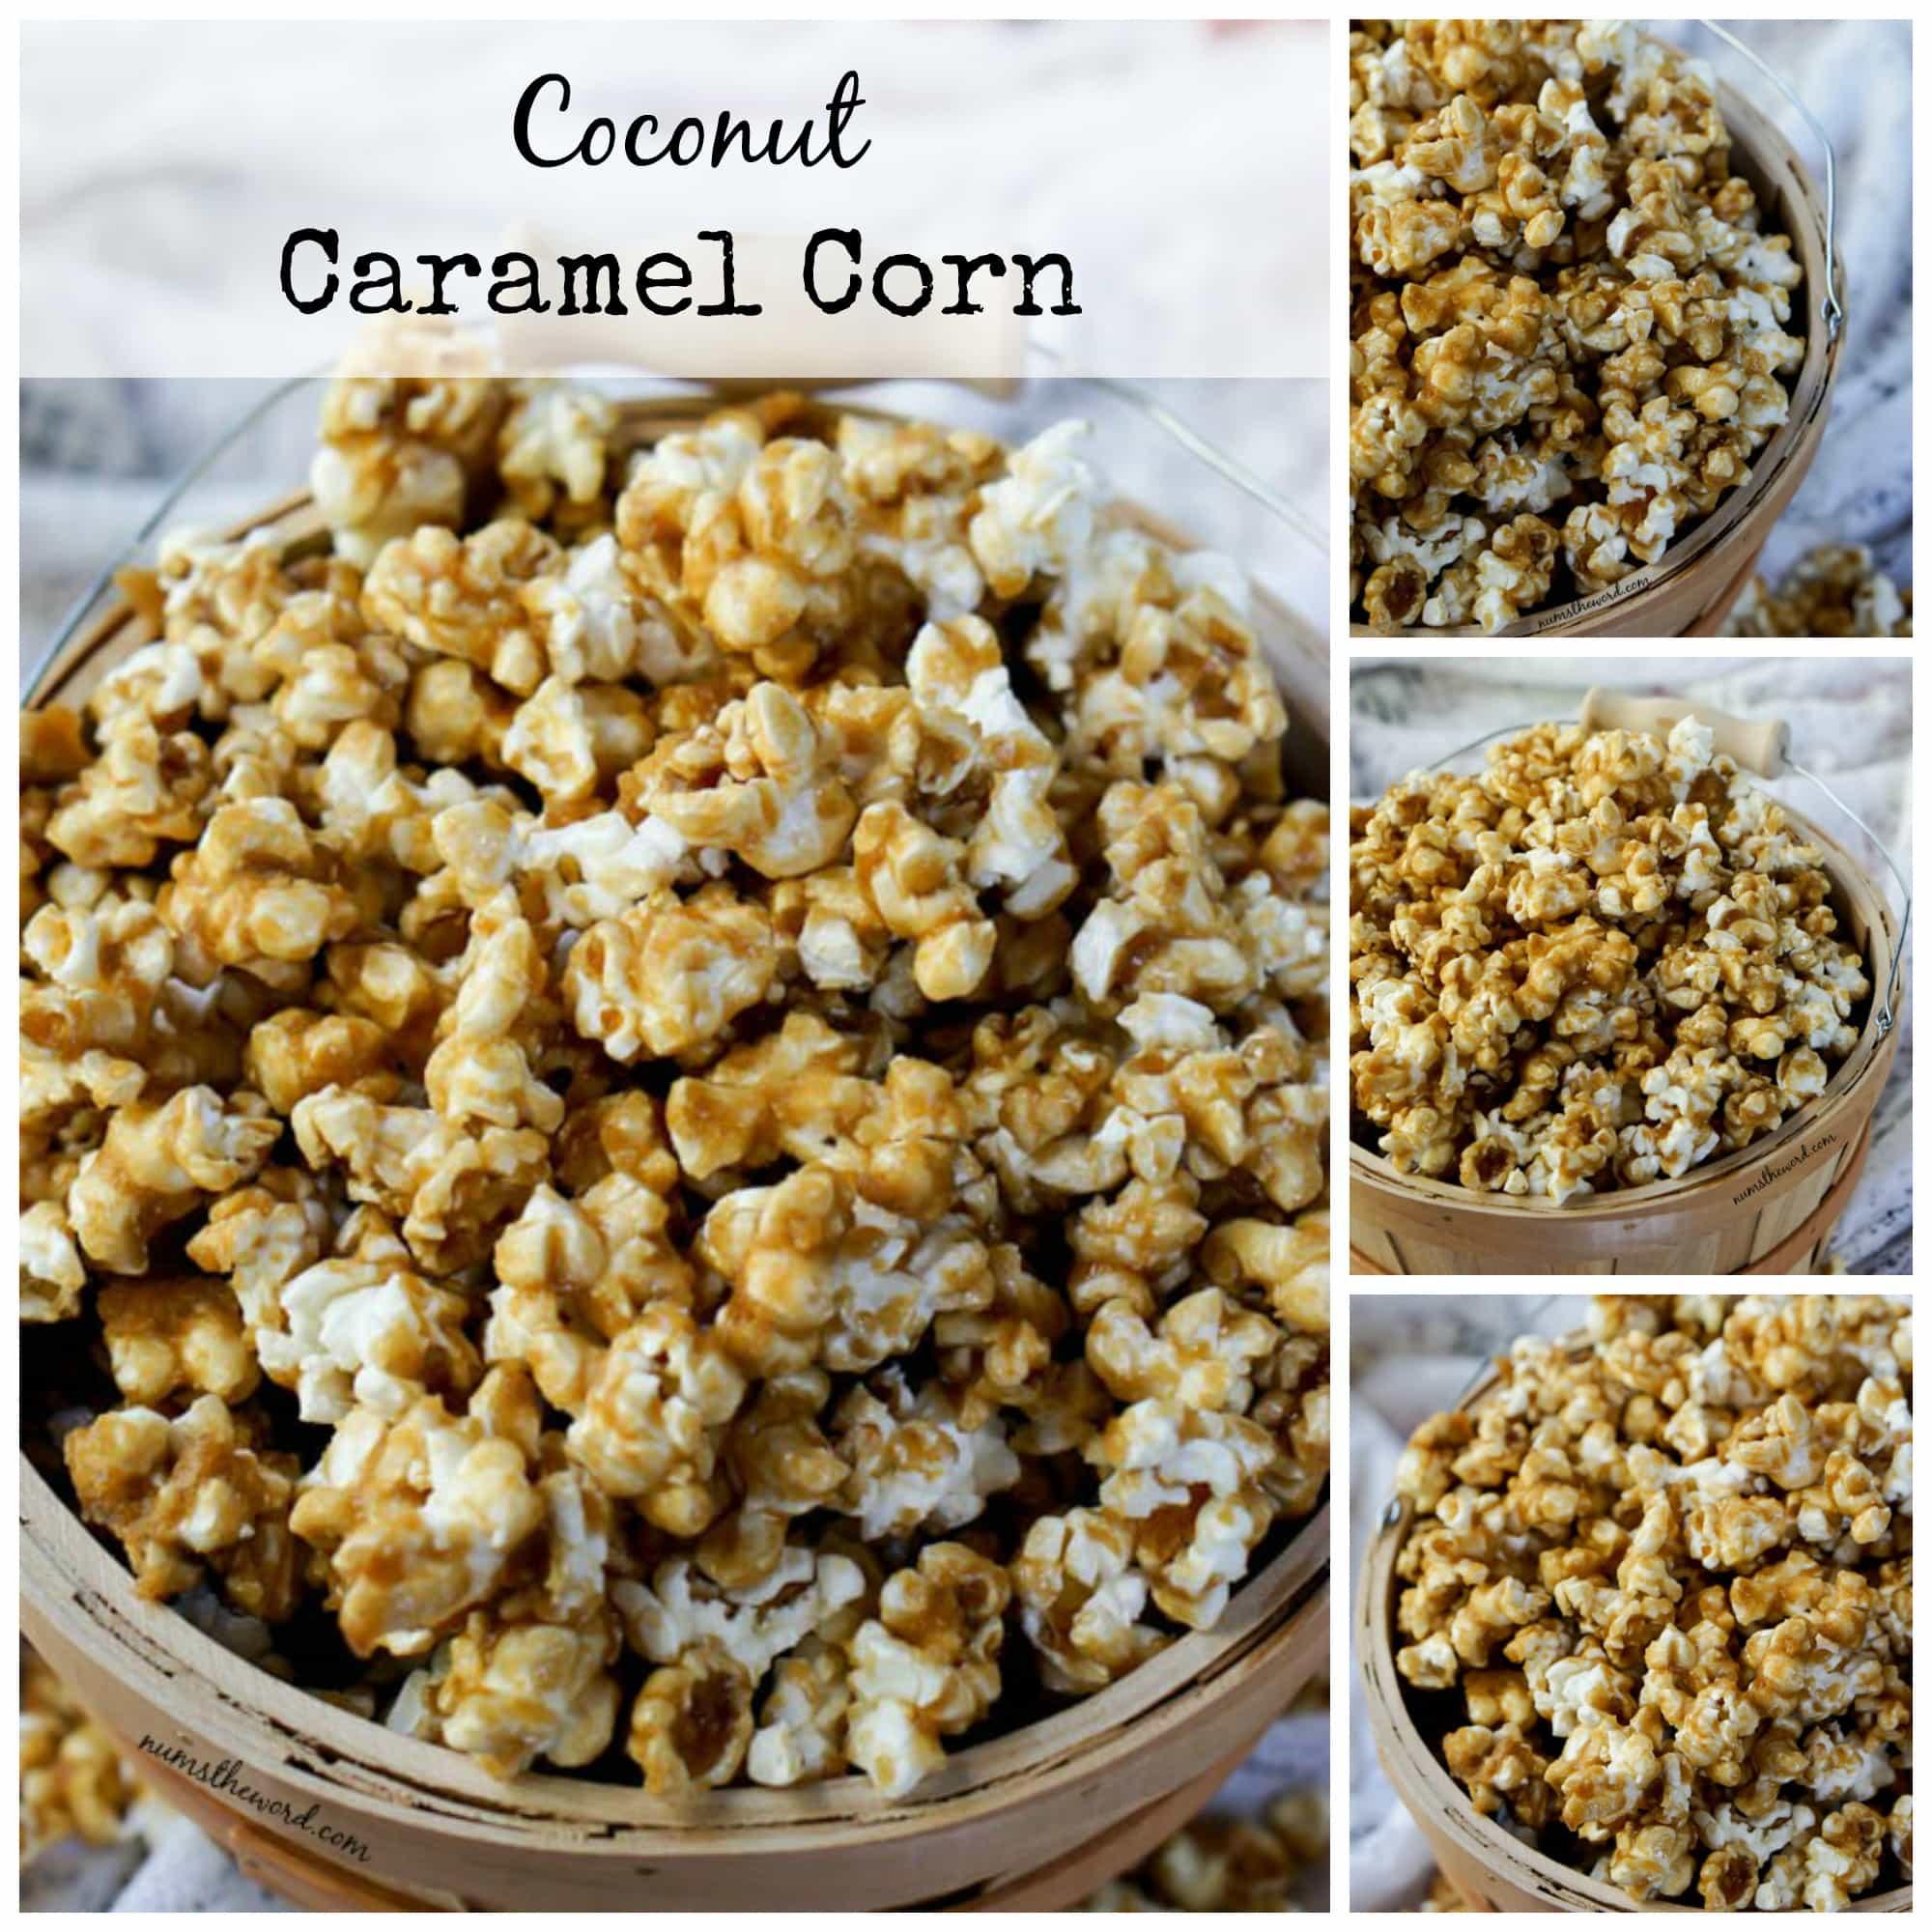 Coconut Caramel Corn - Num's the Word